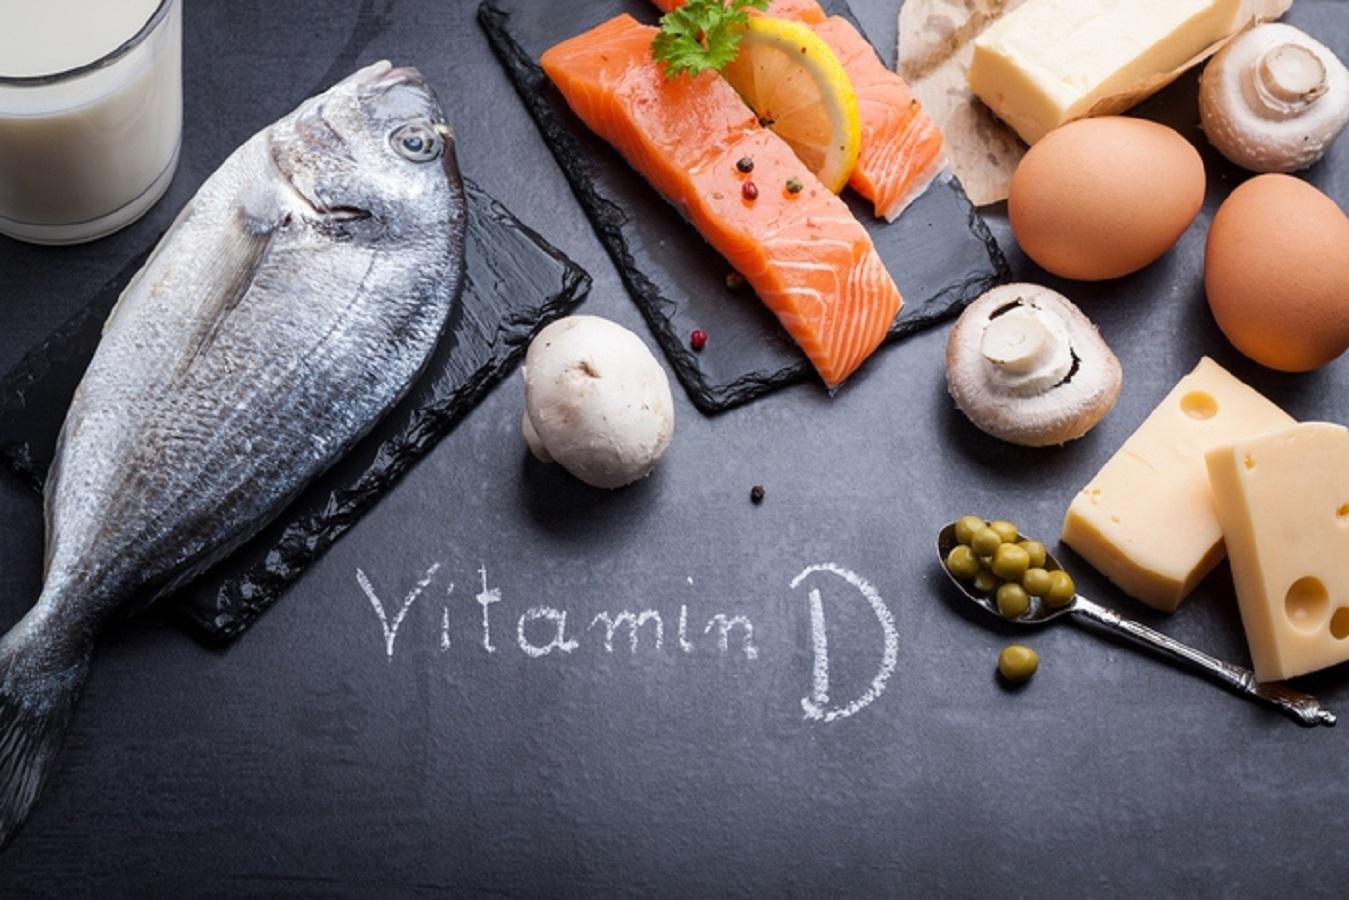 Diabete, carenza di vitamina D aumenta il rischio: cosa mangiare